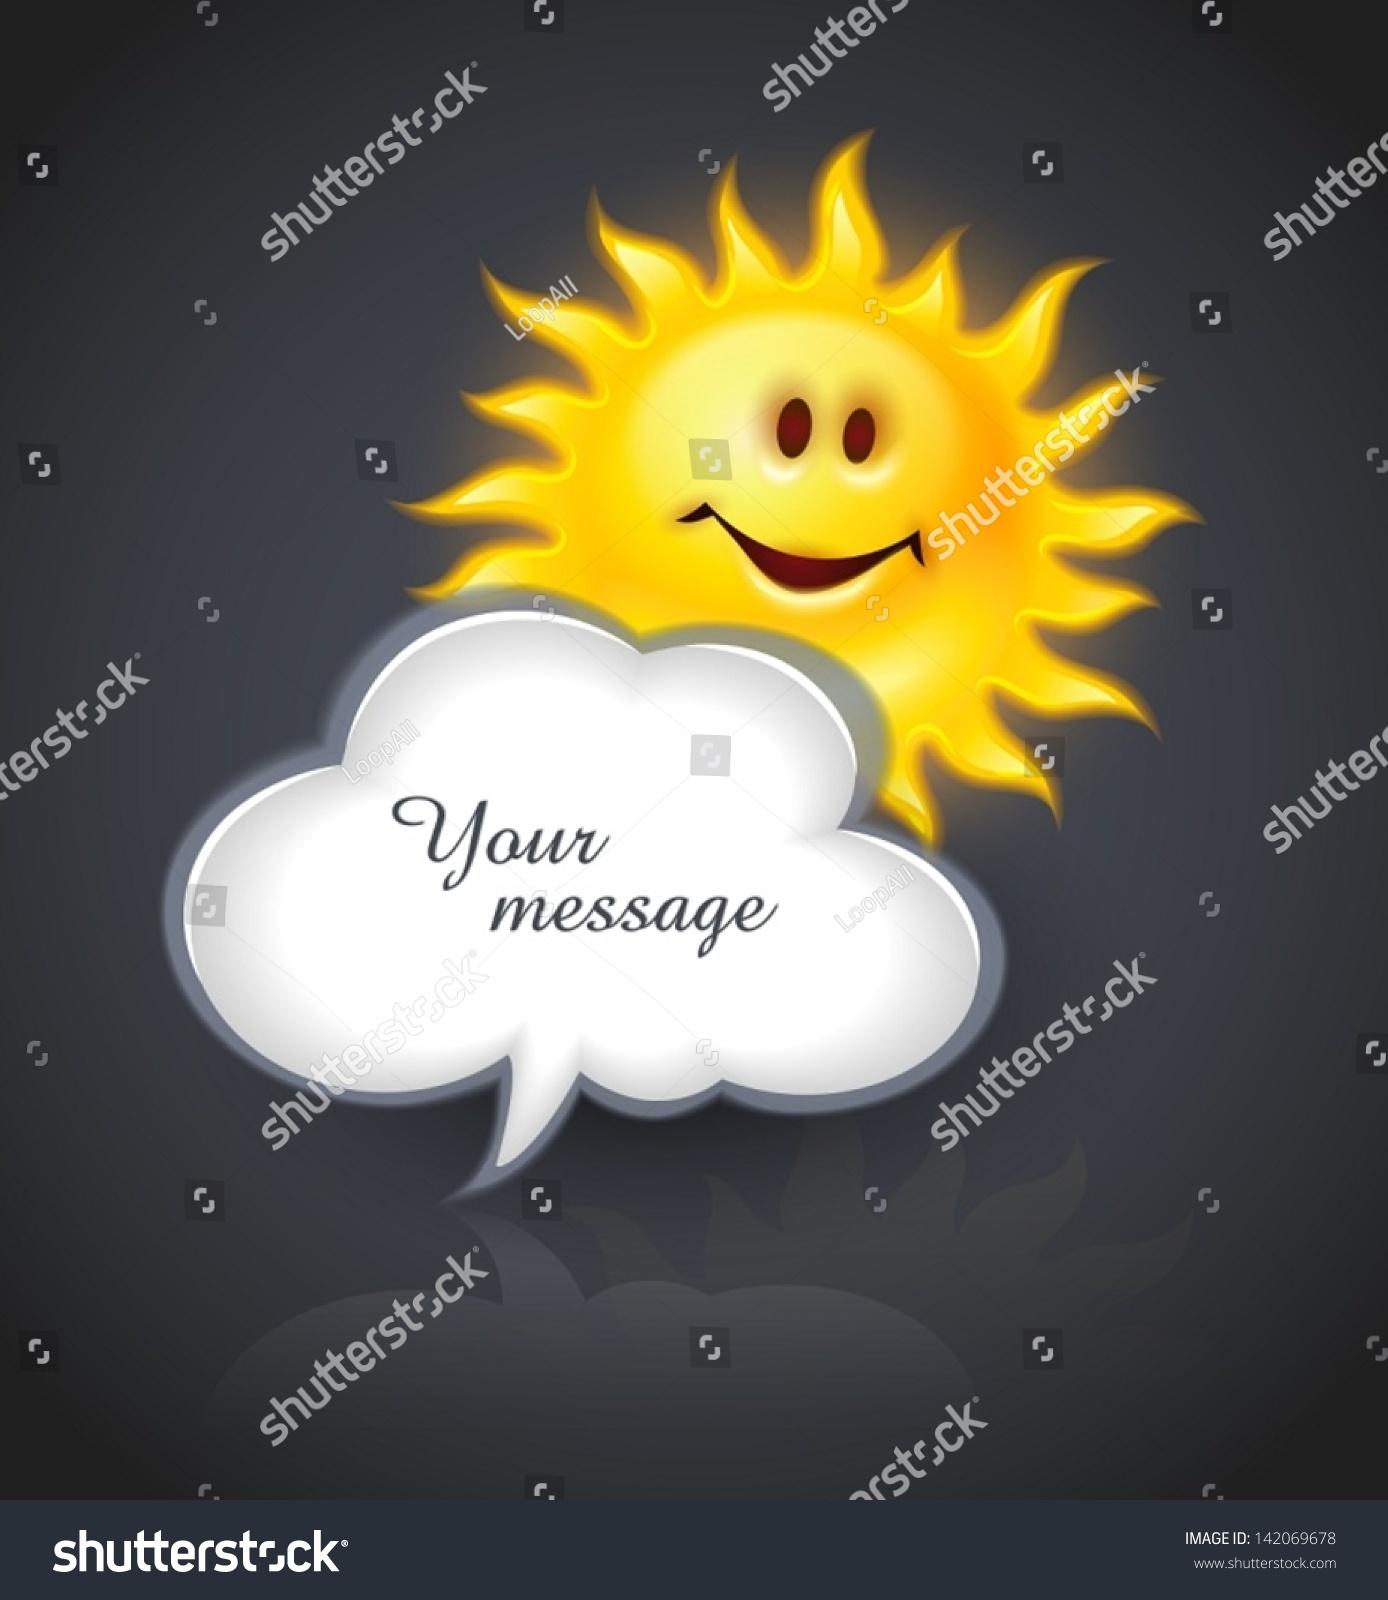 Smiling yellow sun cloud symbol text stock vector 142069678 smiling yellow sun and cloud symbol for text message eps10 vector illustration biocorpaavc Gallery